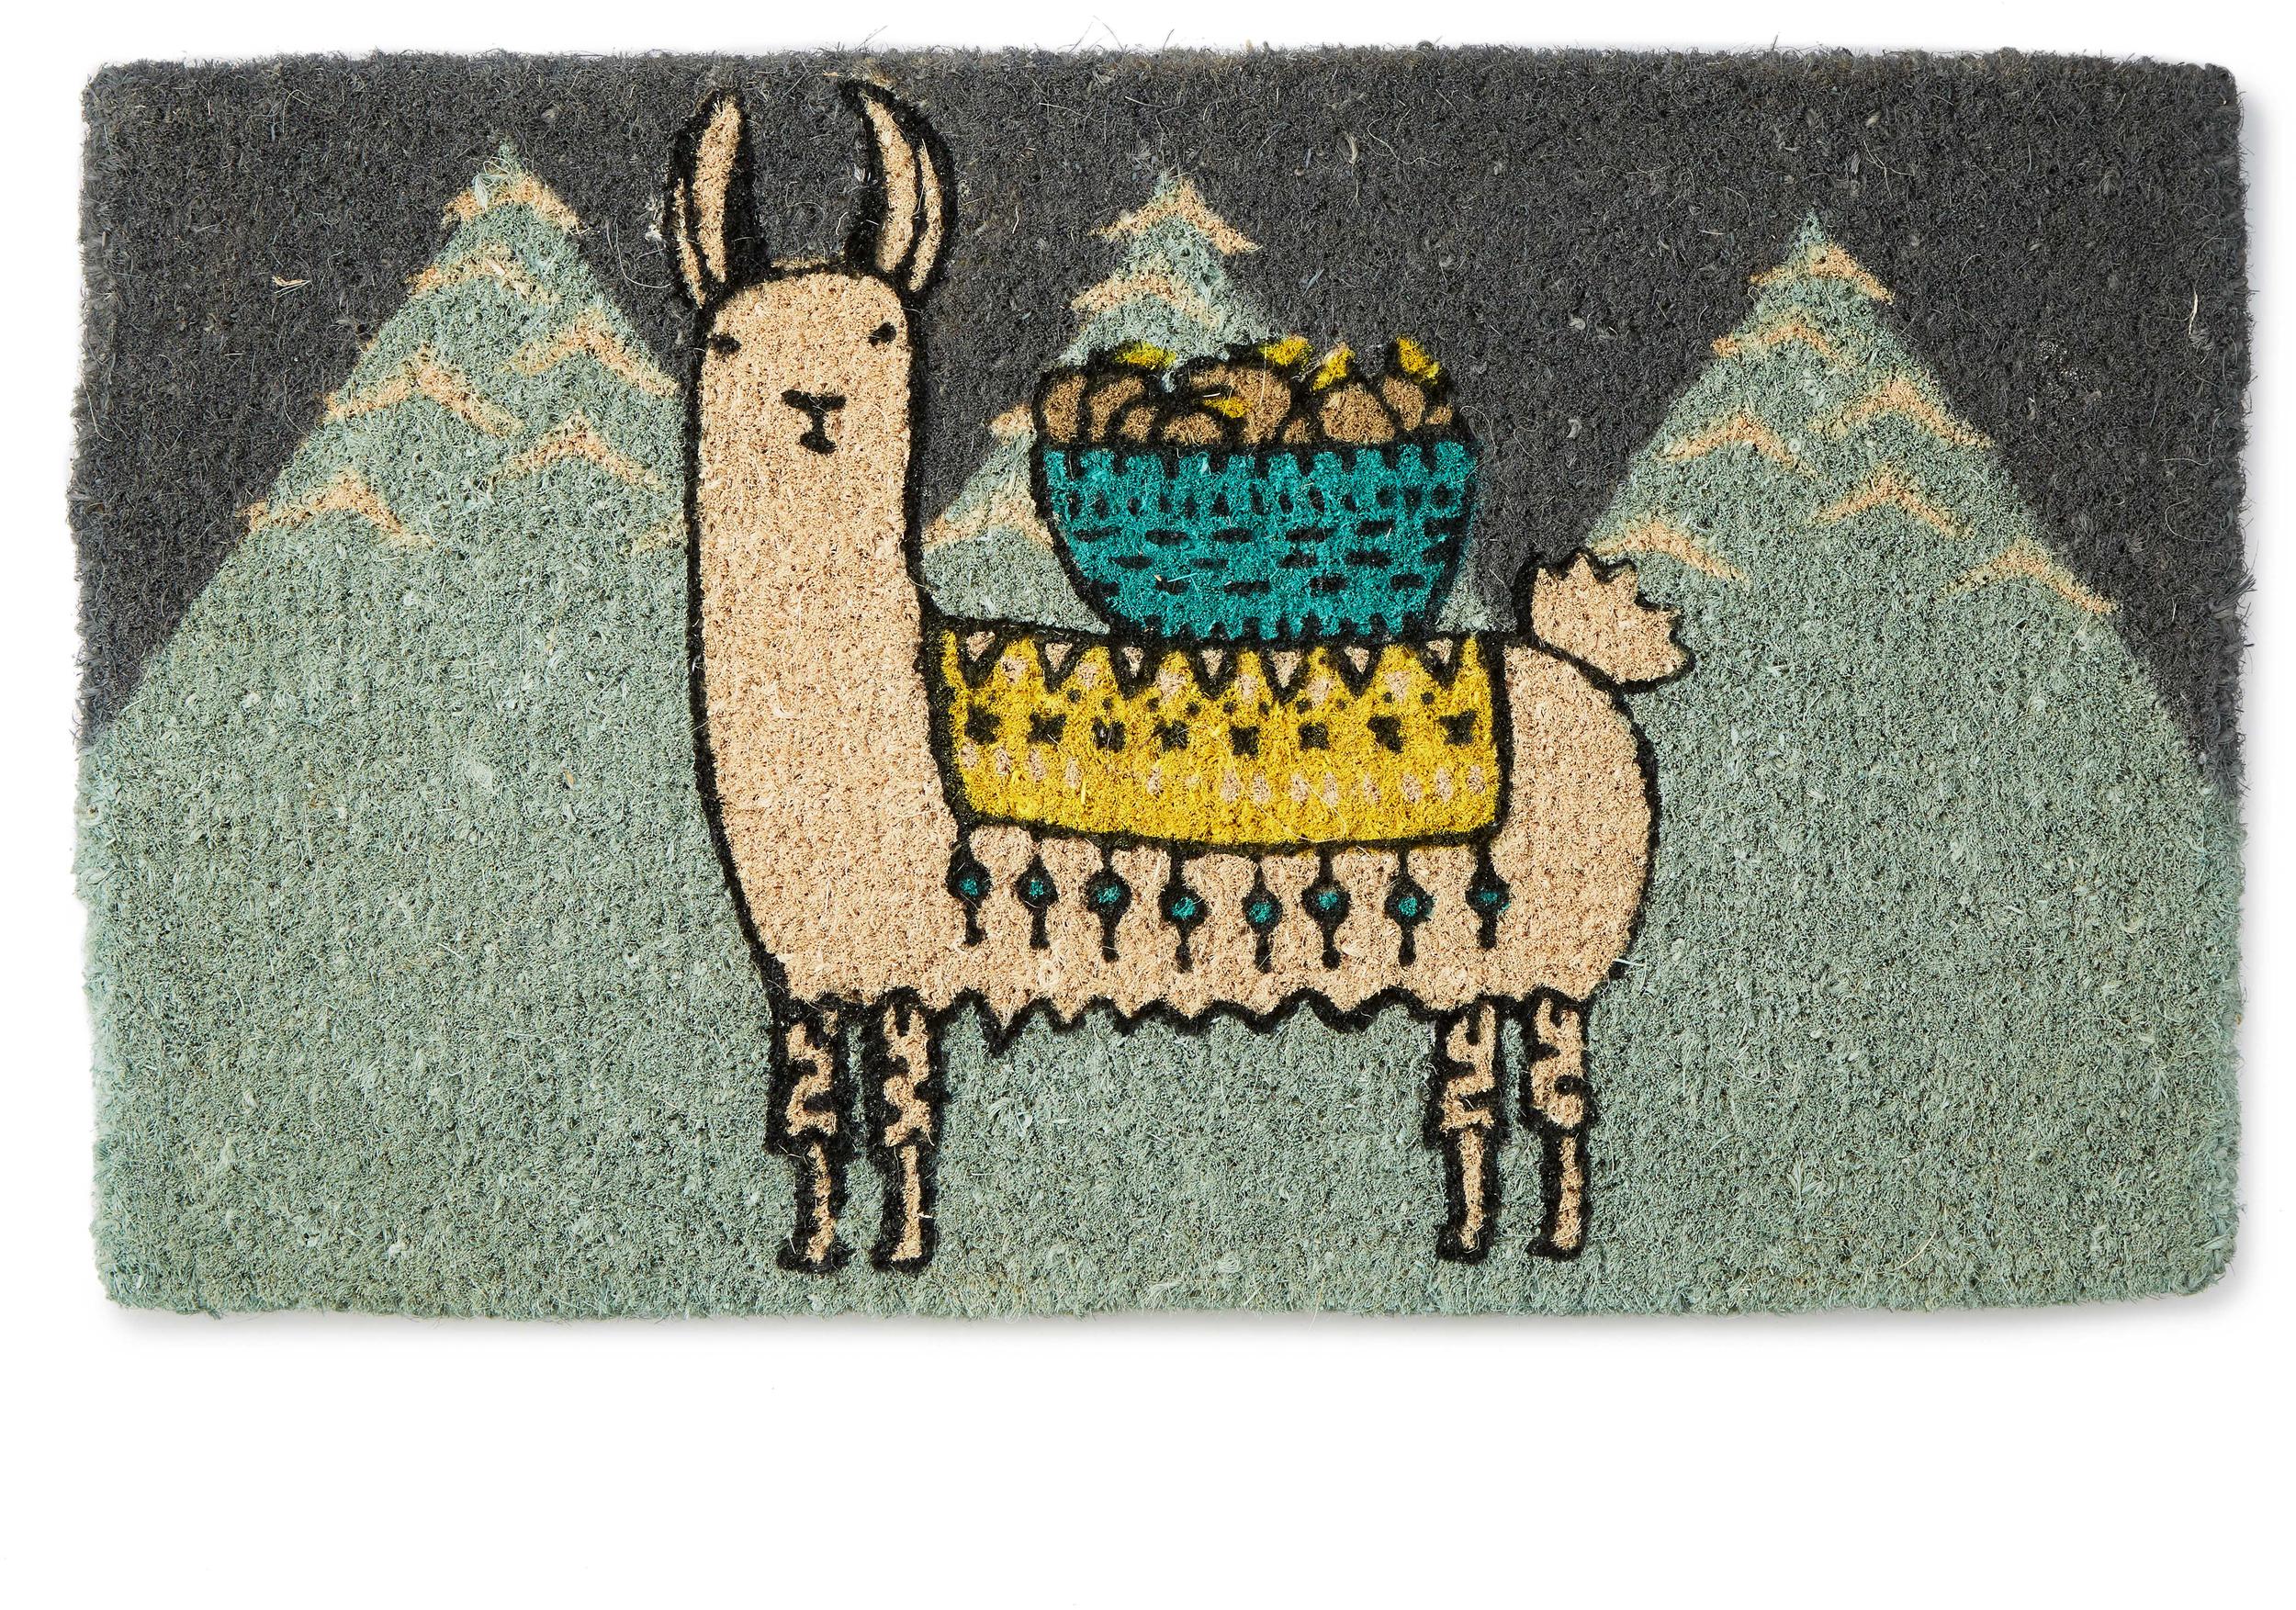 Larry the Llama Doormat | Fun Llama Doormat | UncommonGoods